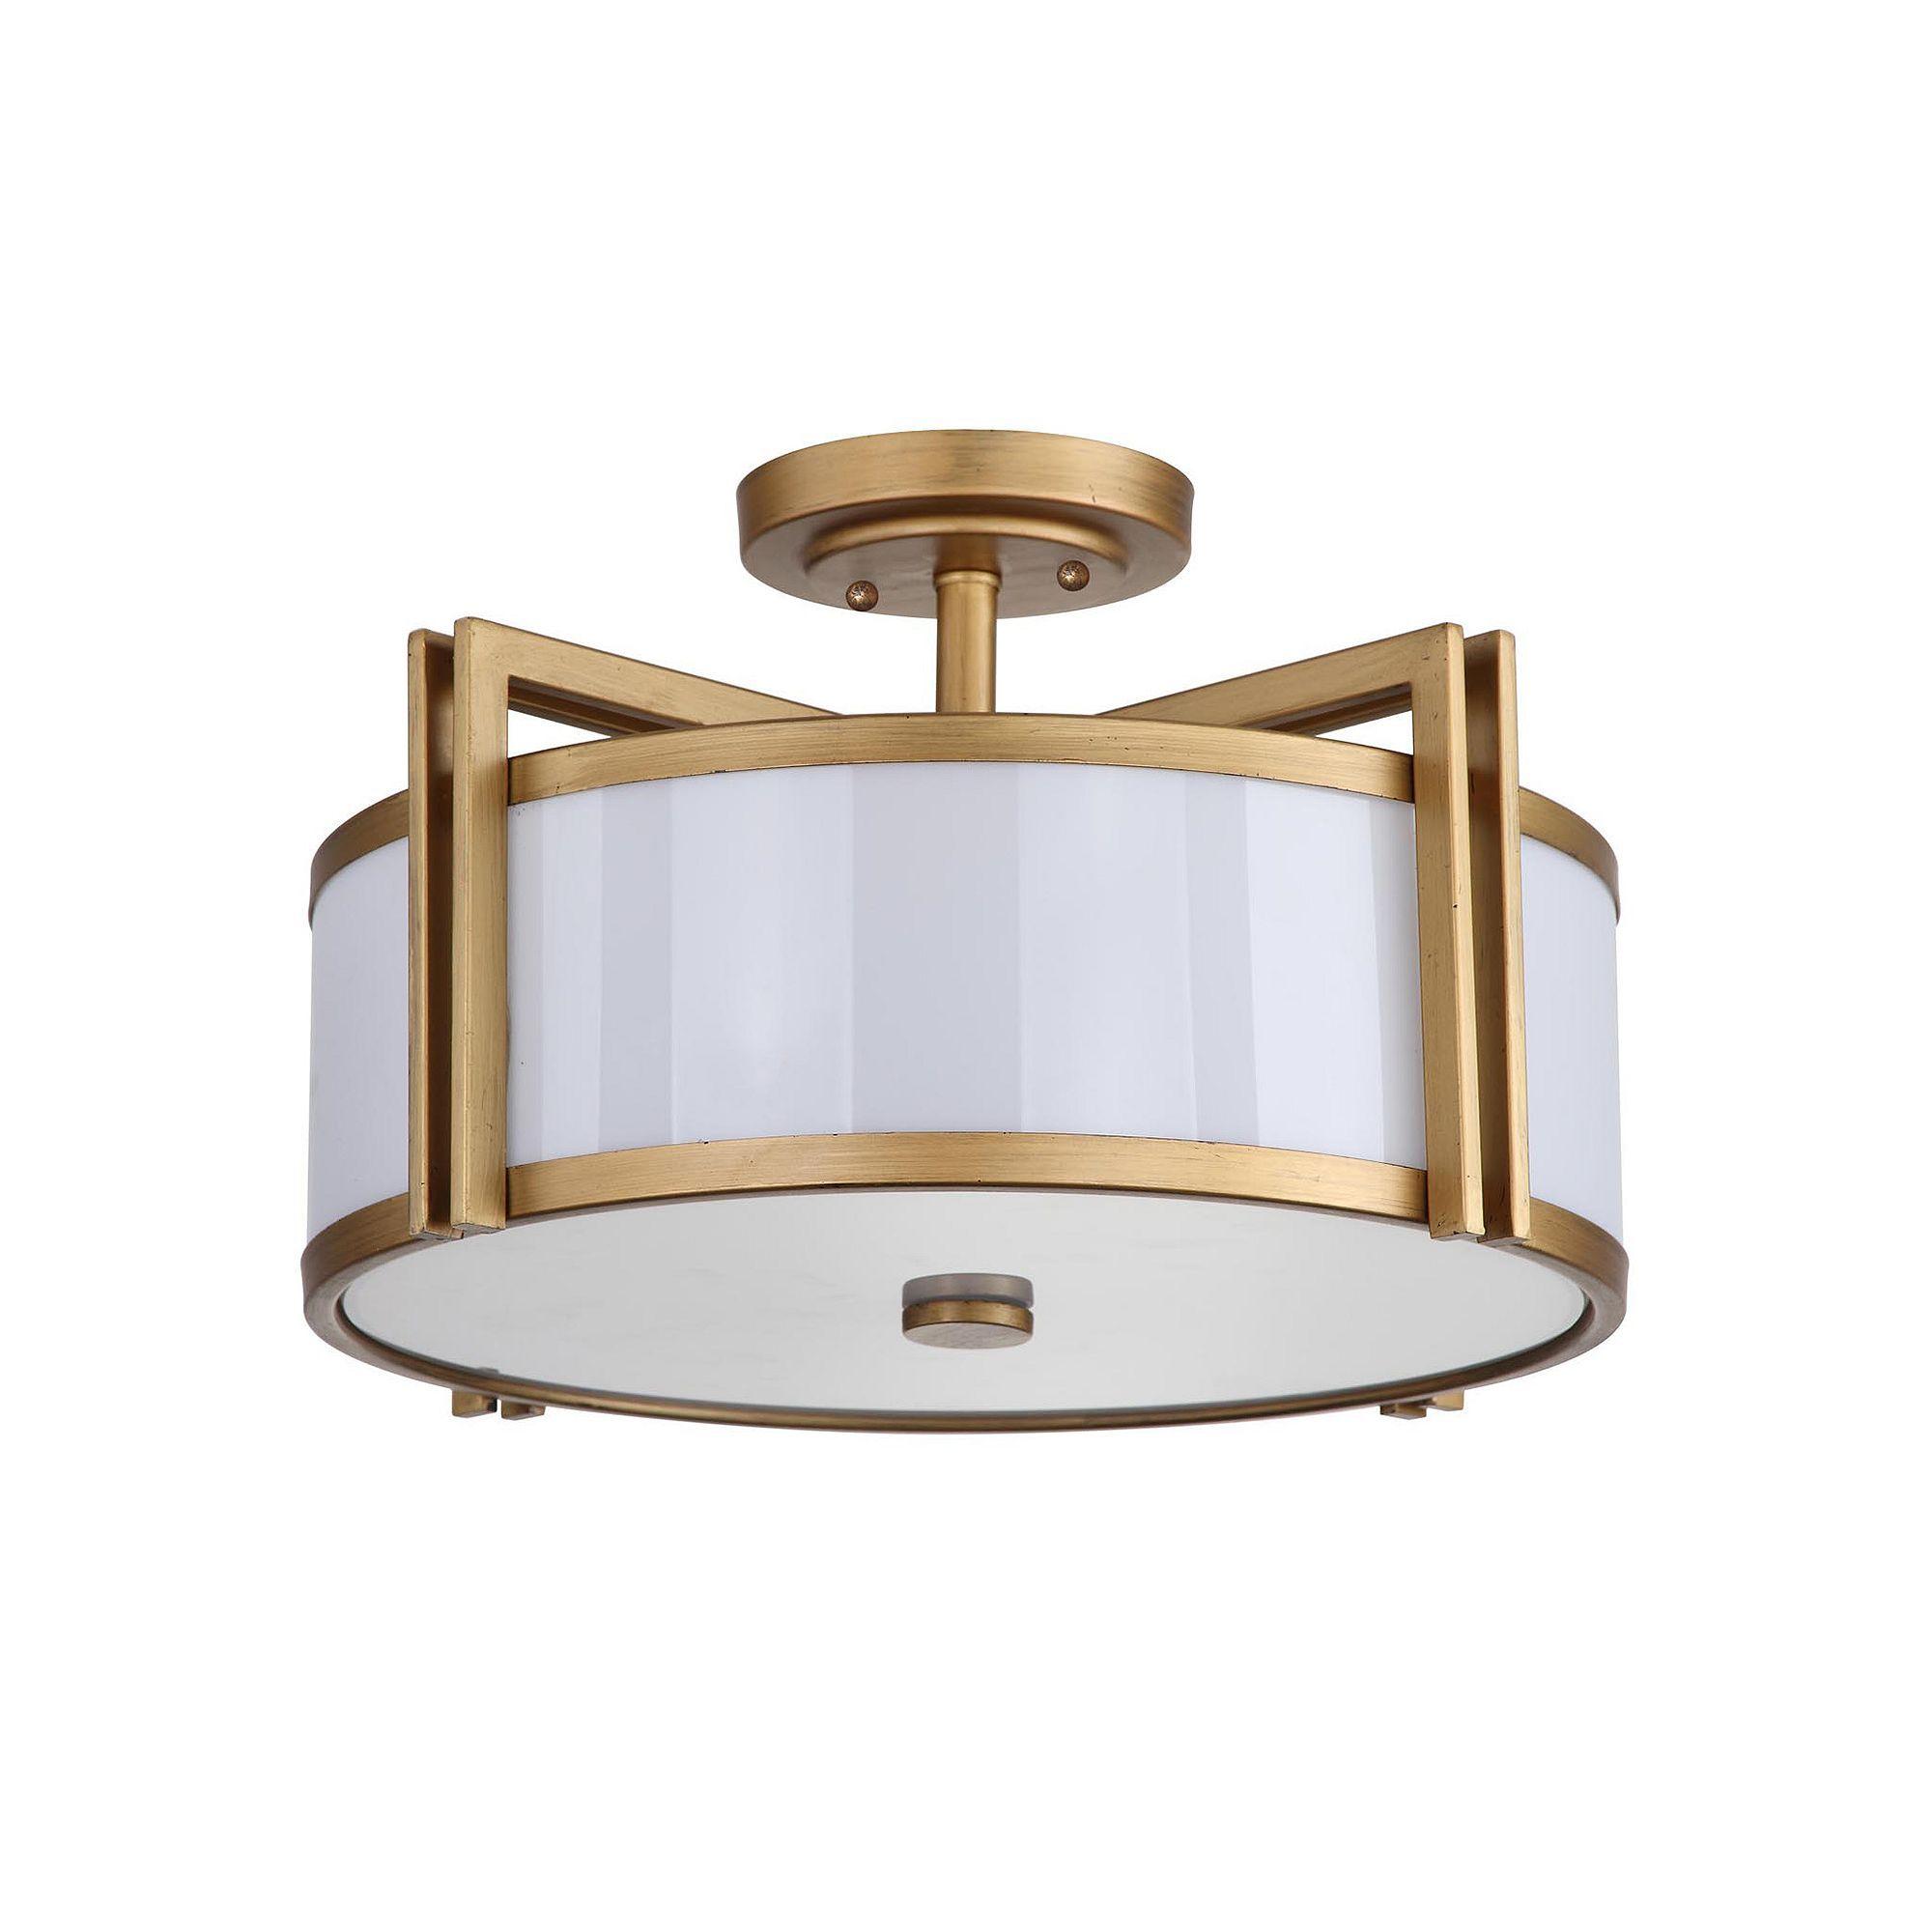 Hallway flush mount lighting  Safavieh Orb SemiFlush Mount Ceiling Light Gold  Pinterest